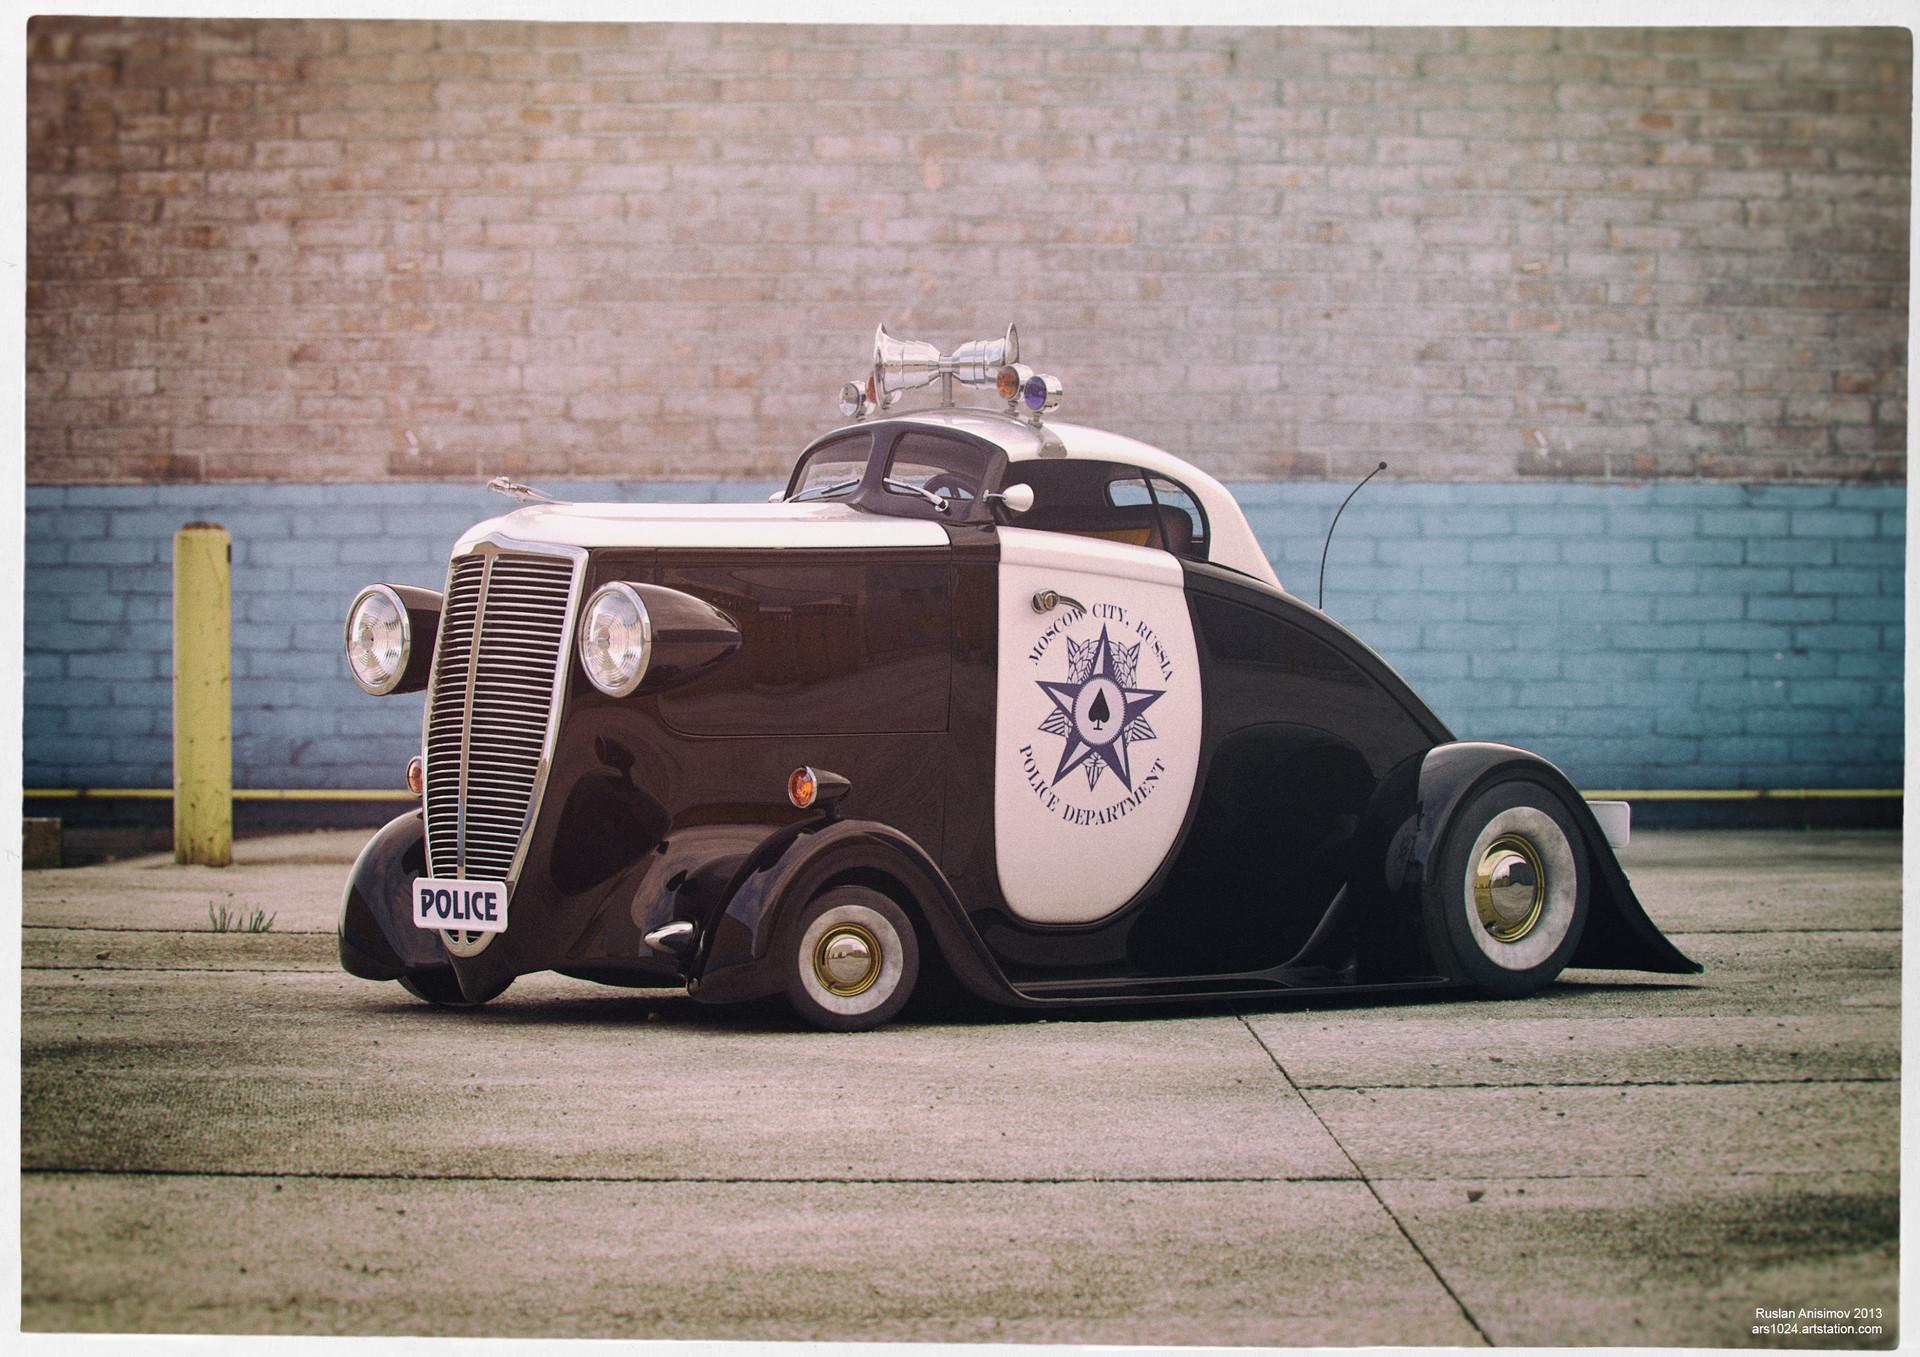 Ruslan anisimov 2013 policecar01